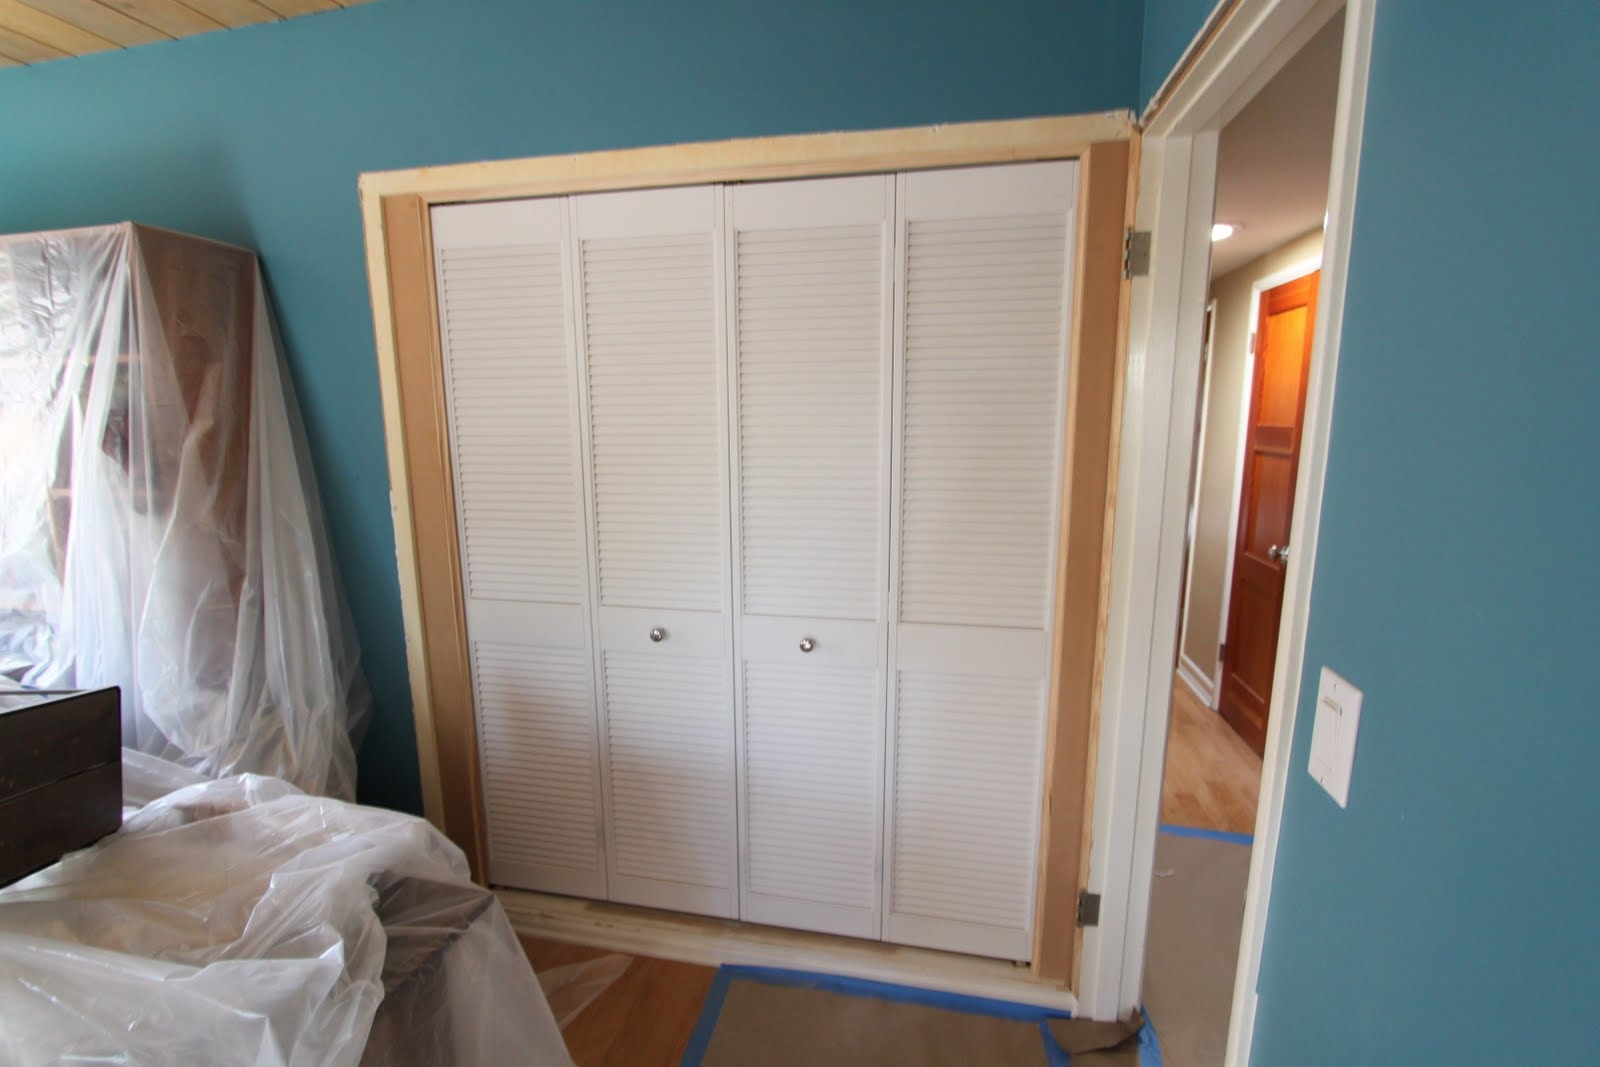 Slatted Sliding Wardrobe Doorsmodern vented closet doors roselawnlutheran